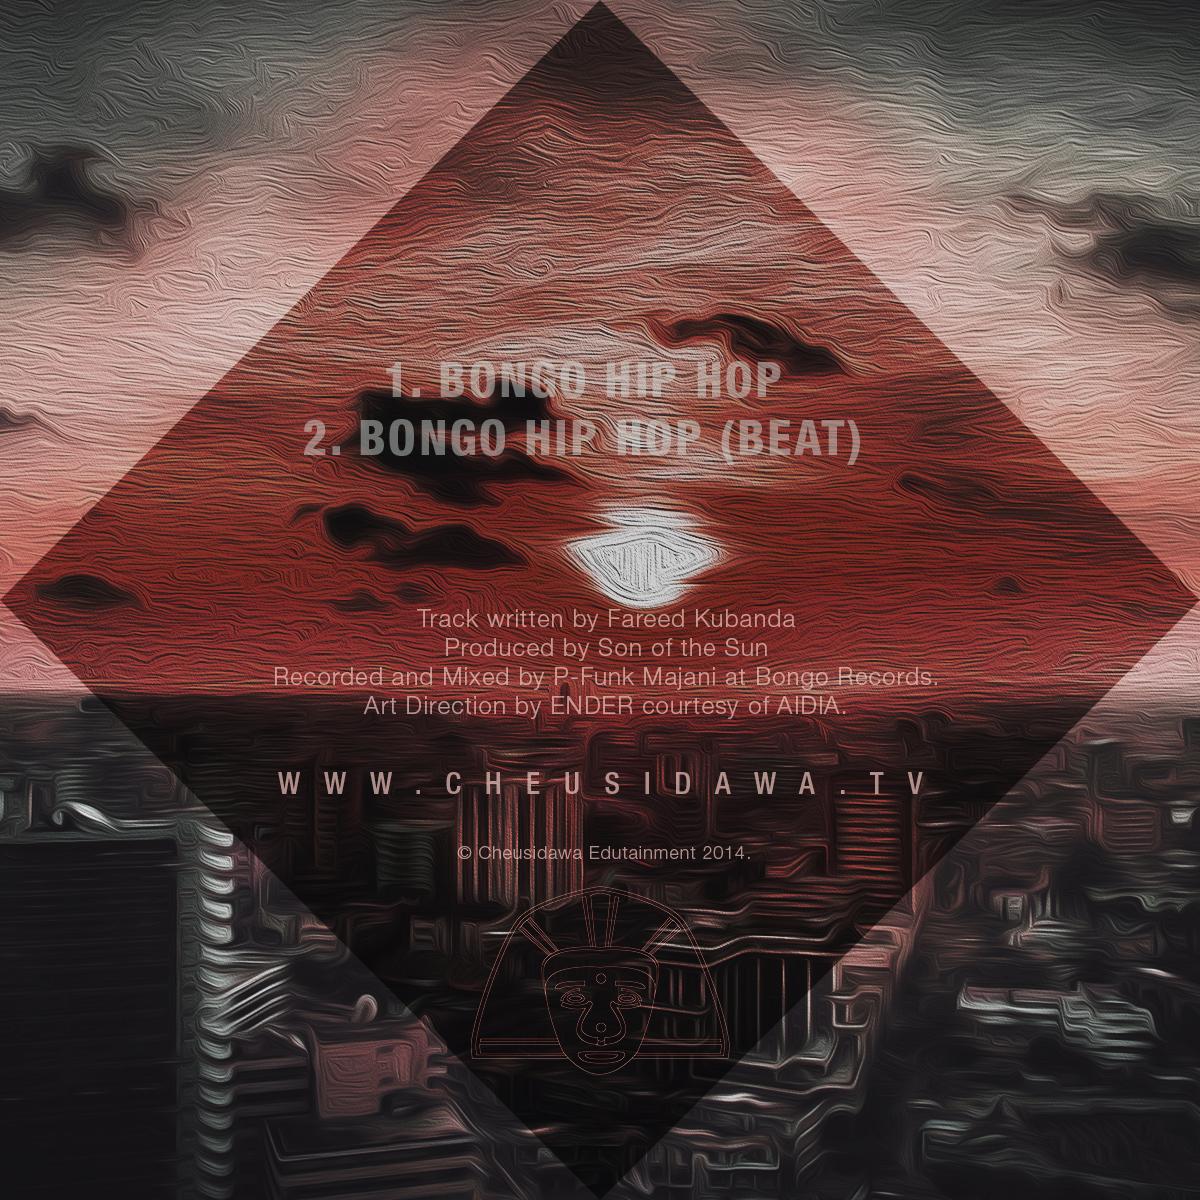 Bongo Hip-Hop-Fid Q